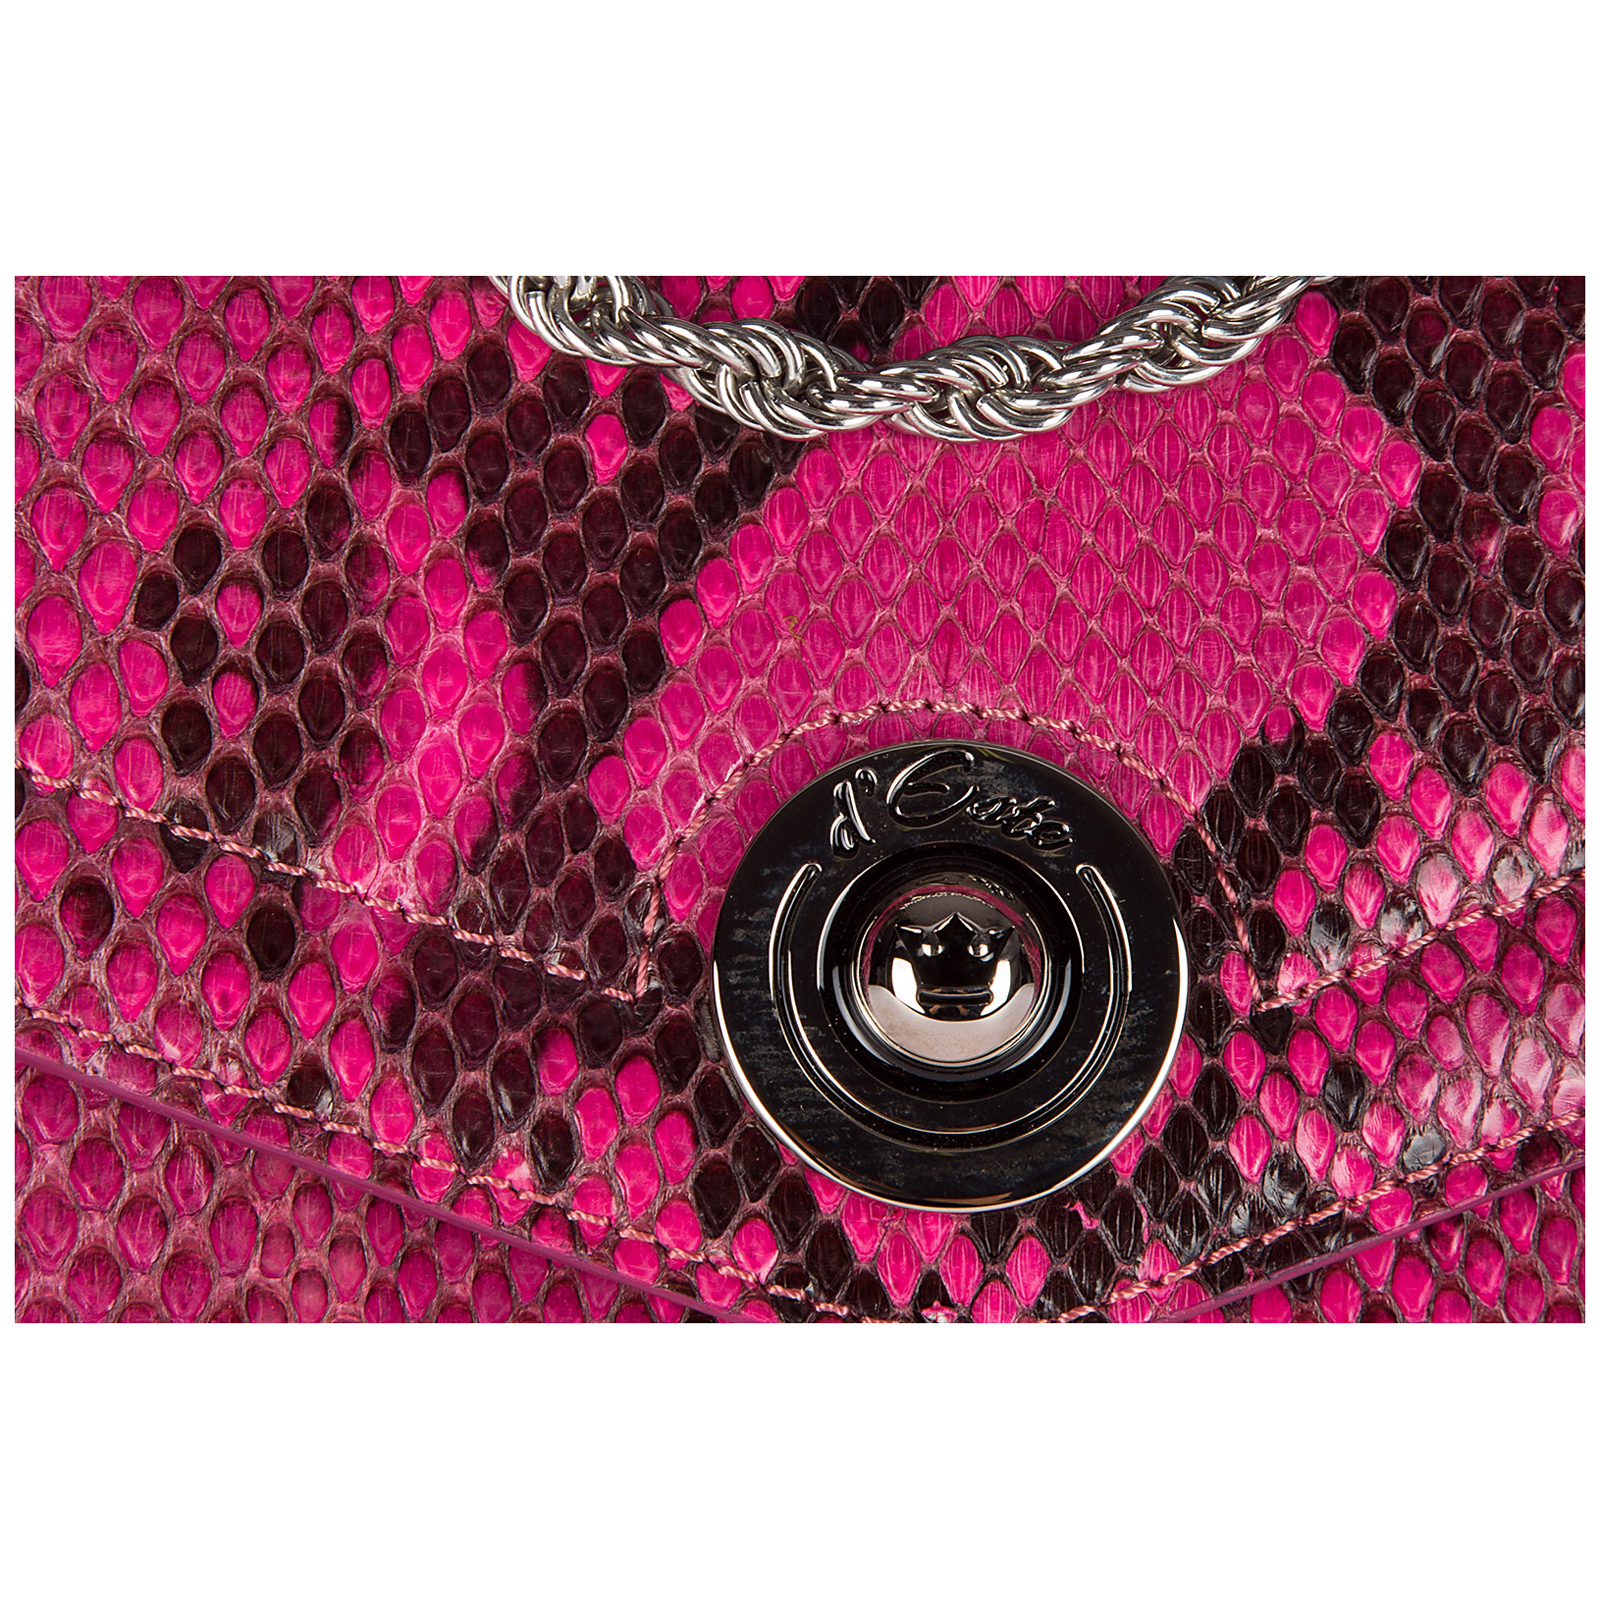 Women's clutch with shoulder strap handbag bag purse  pitone